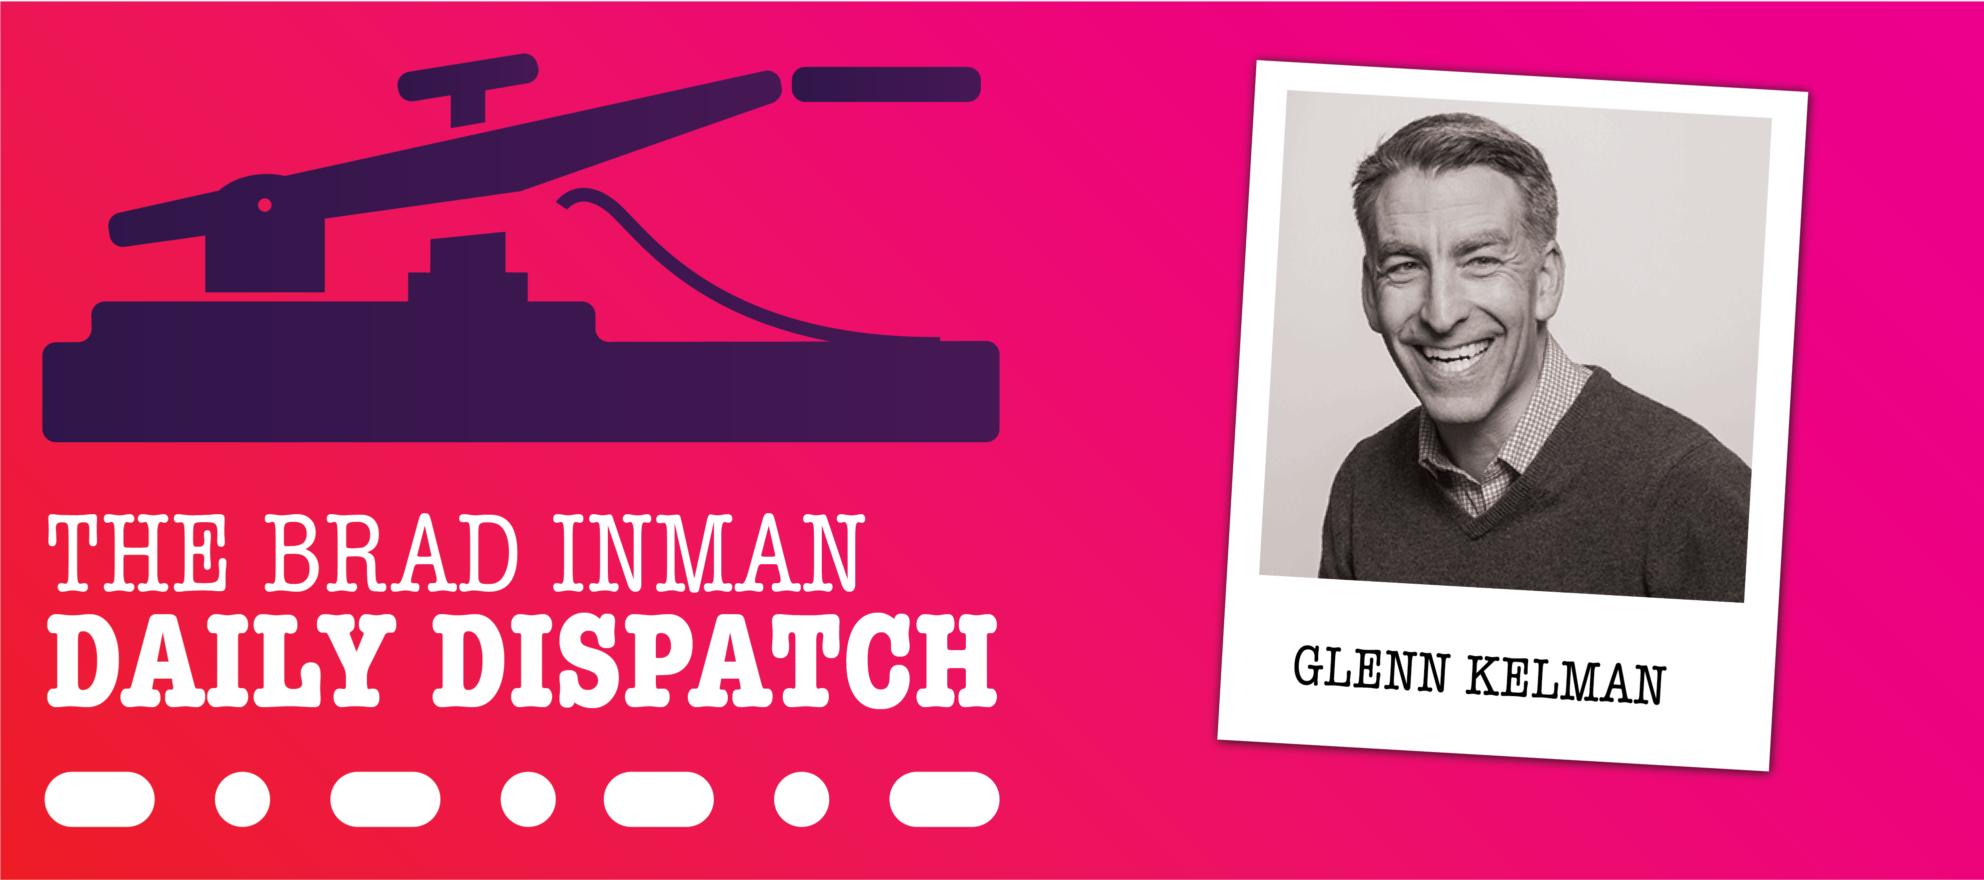 Daily Dispatch: Brad Inman with Glenn Kelman